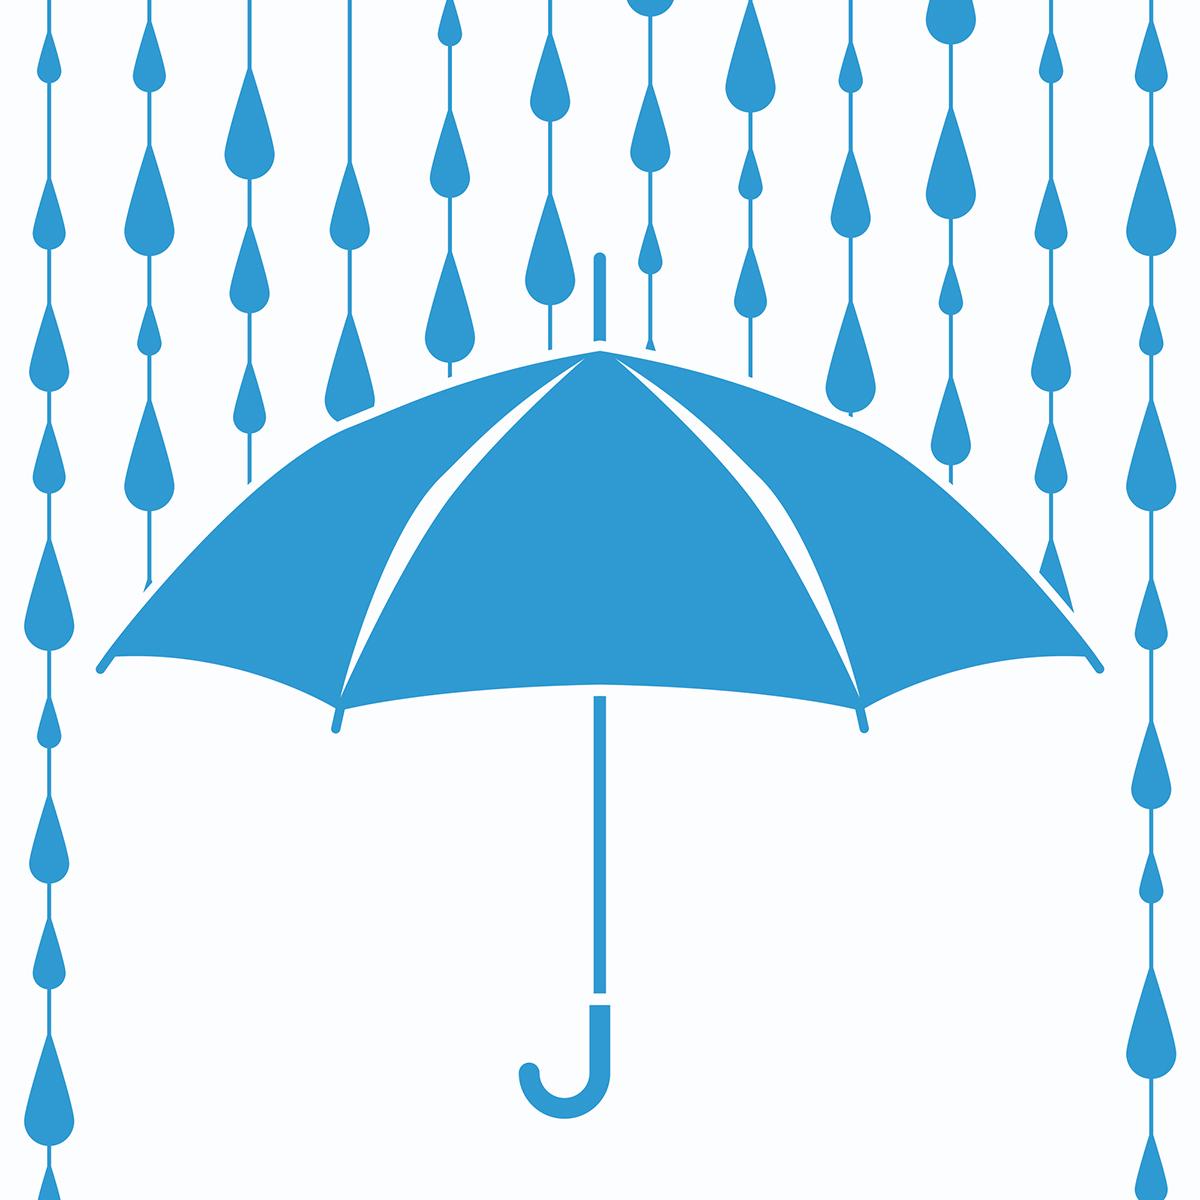 blue umbrella with raindrops falling